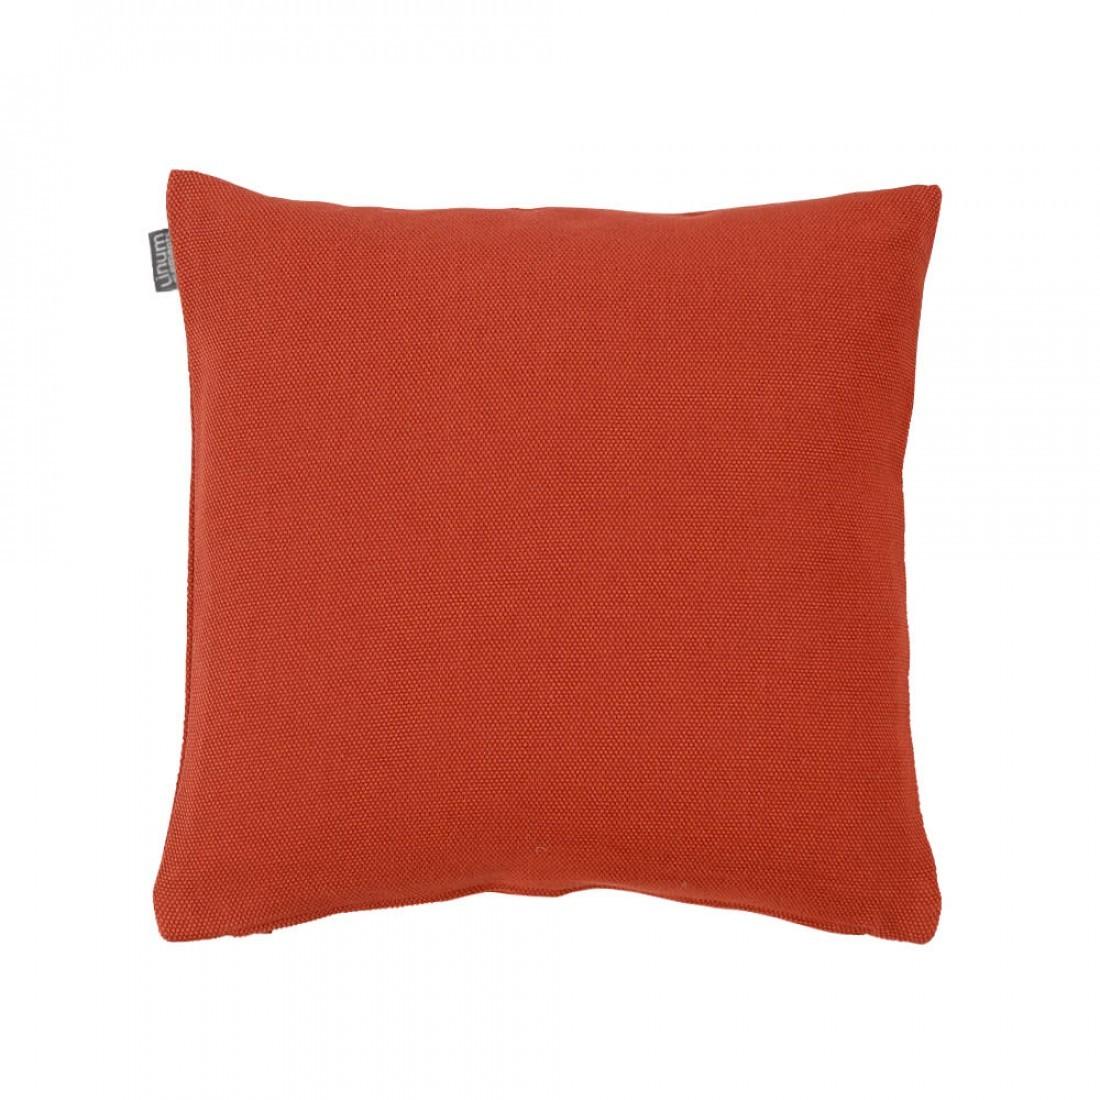 Home Kussenhoes Linum Pepper donker oranje 40x40cm